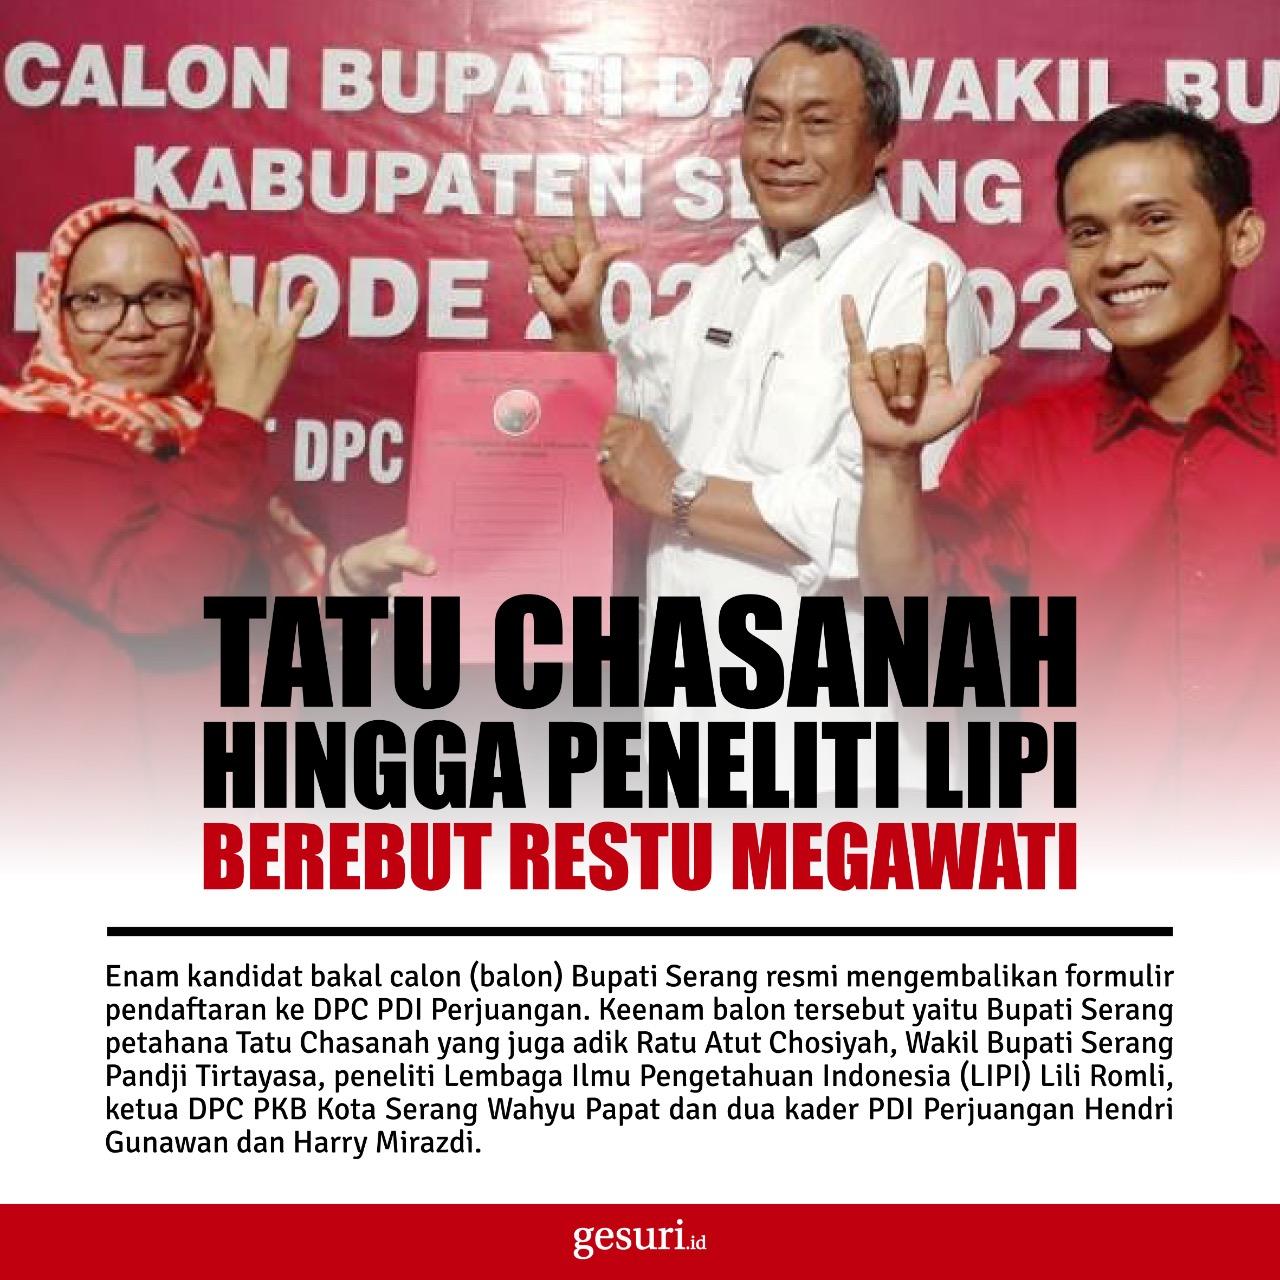 Enam Kandidat Balon Bupati Serang Berebut Restu Megawati